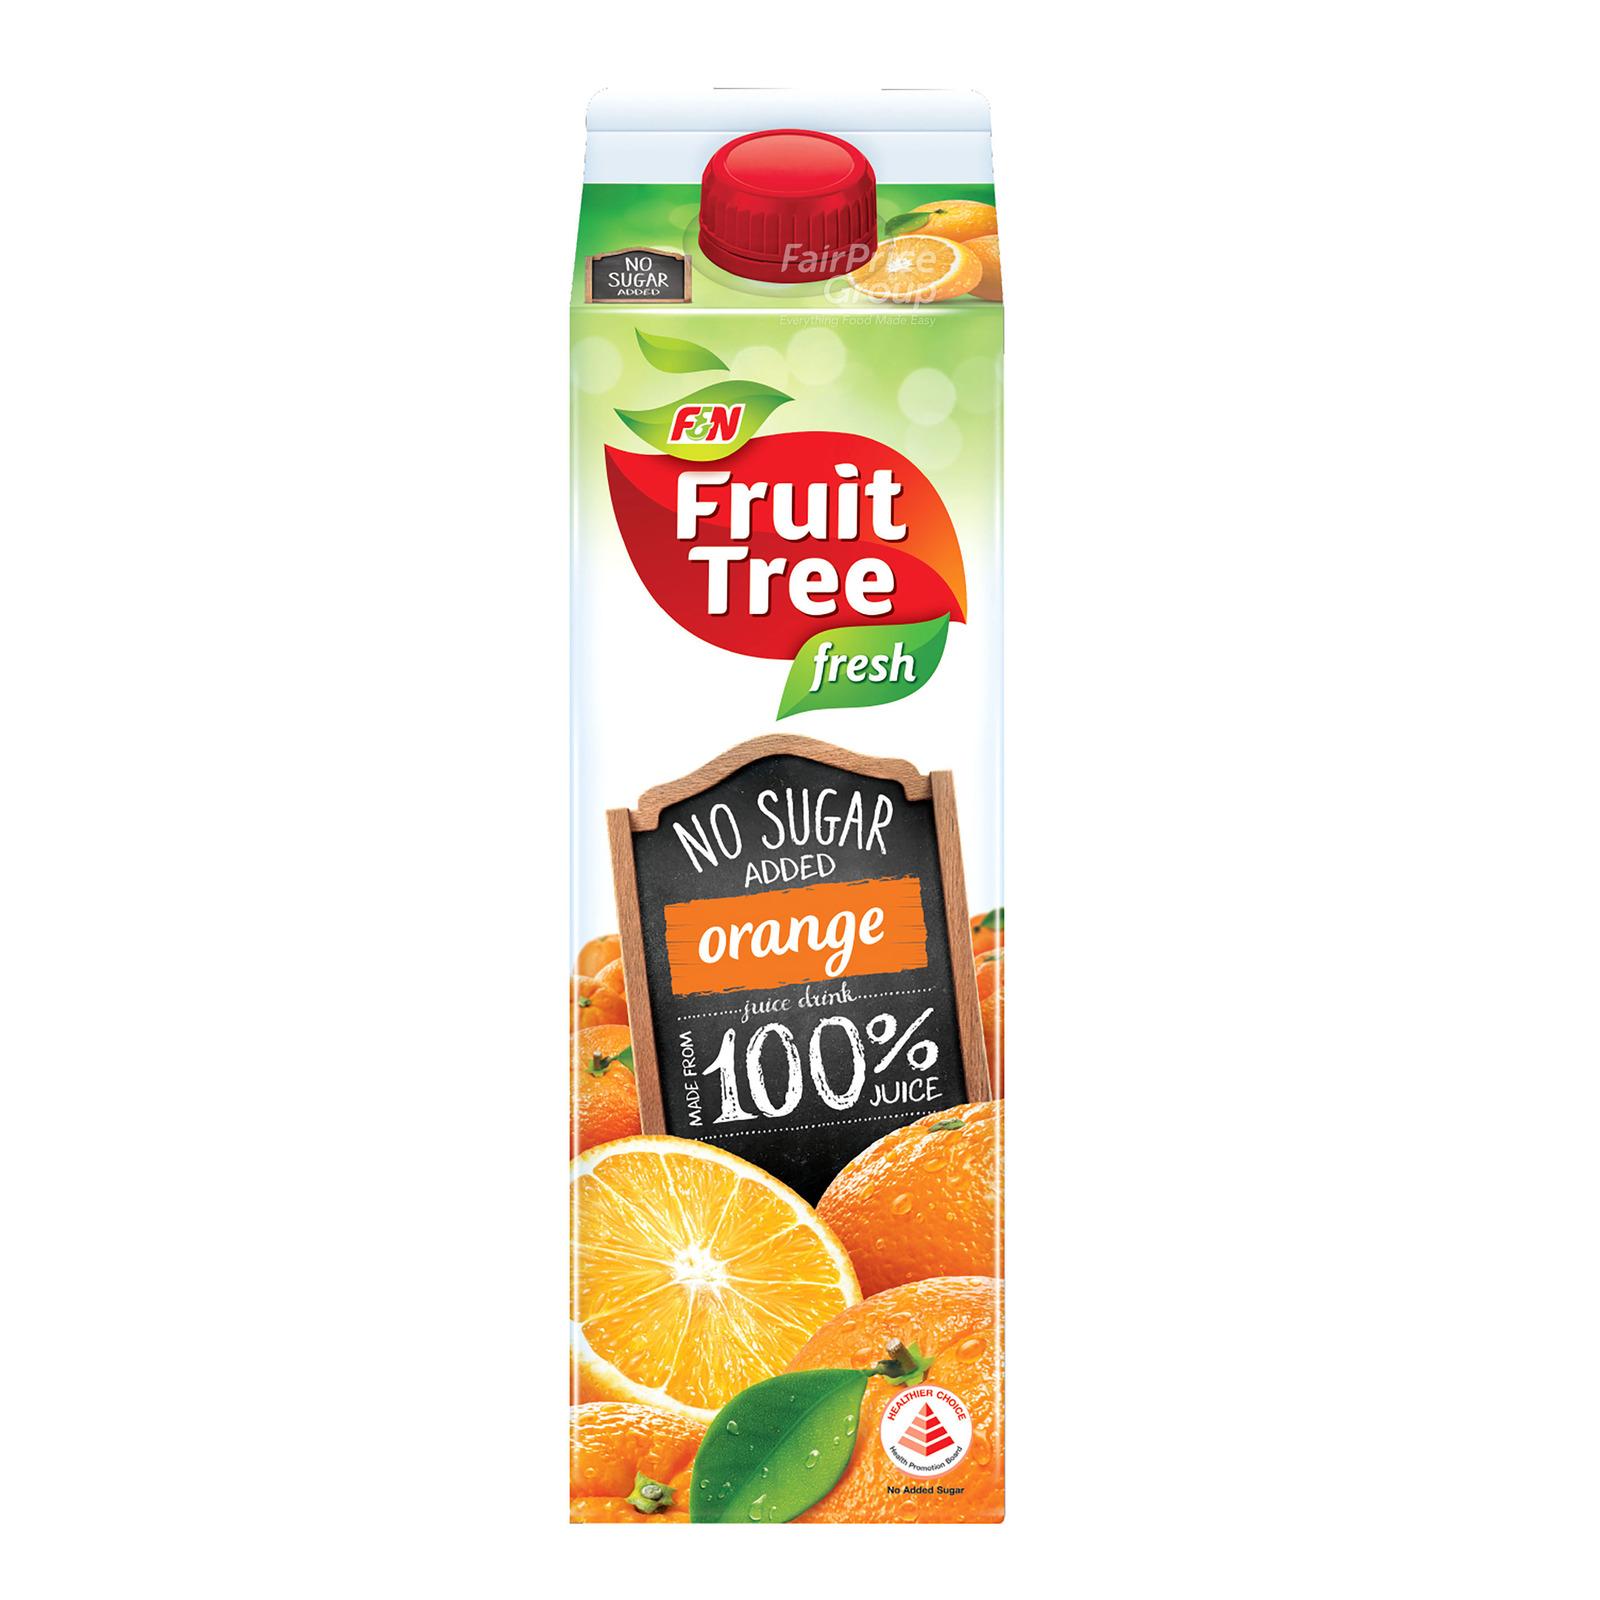 F&N Fruit Tree Fresh No Sugar Added Juice - Orange